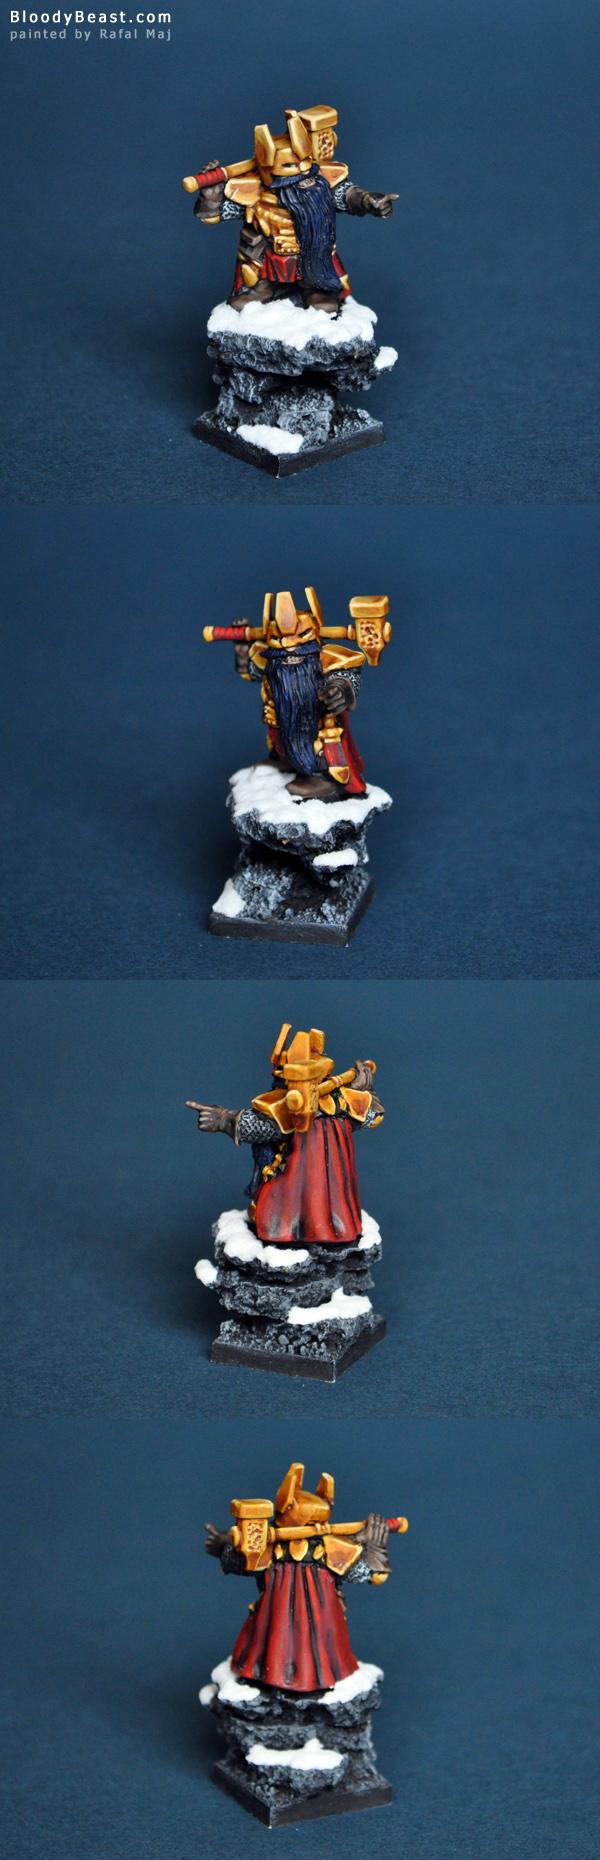 Mantic Dwarf King painted by Rafal Maj (BloodyBeast.com)